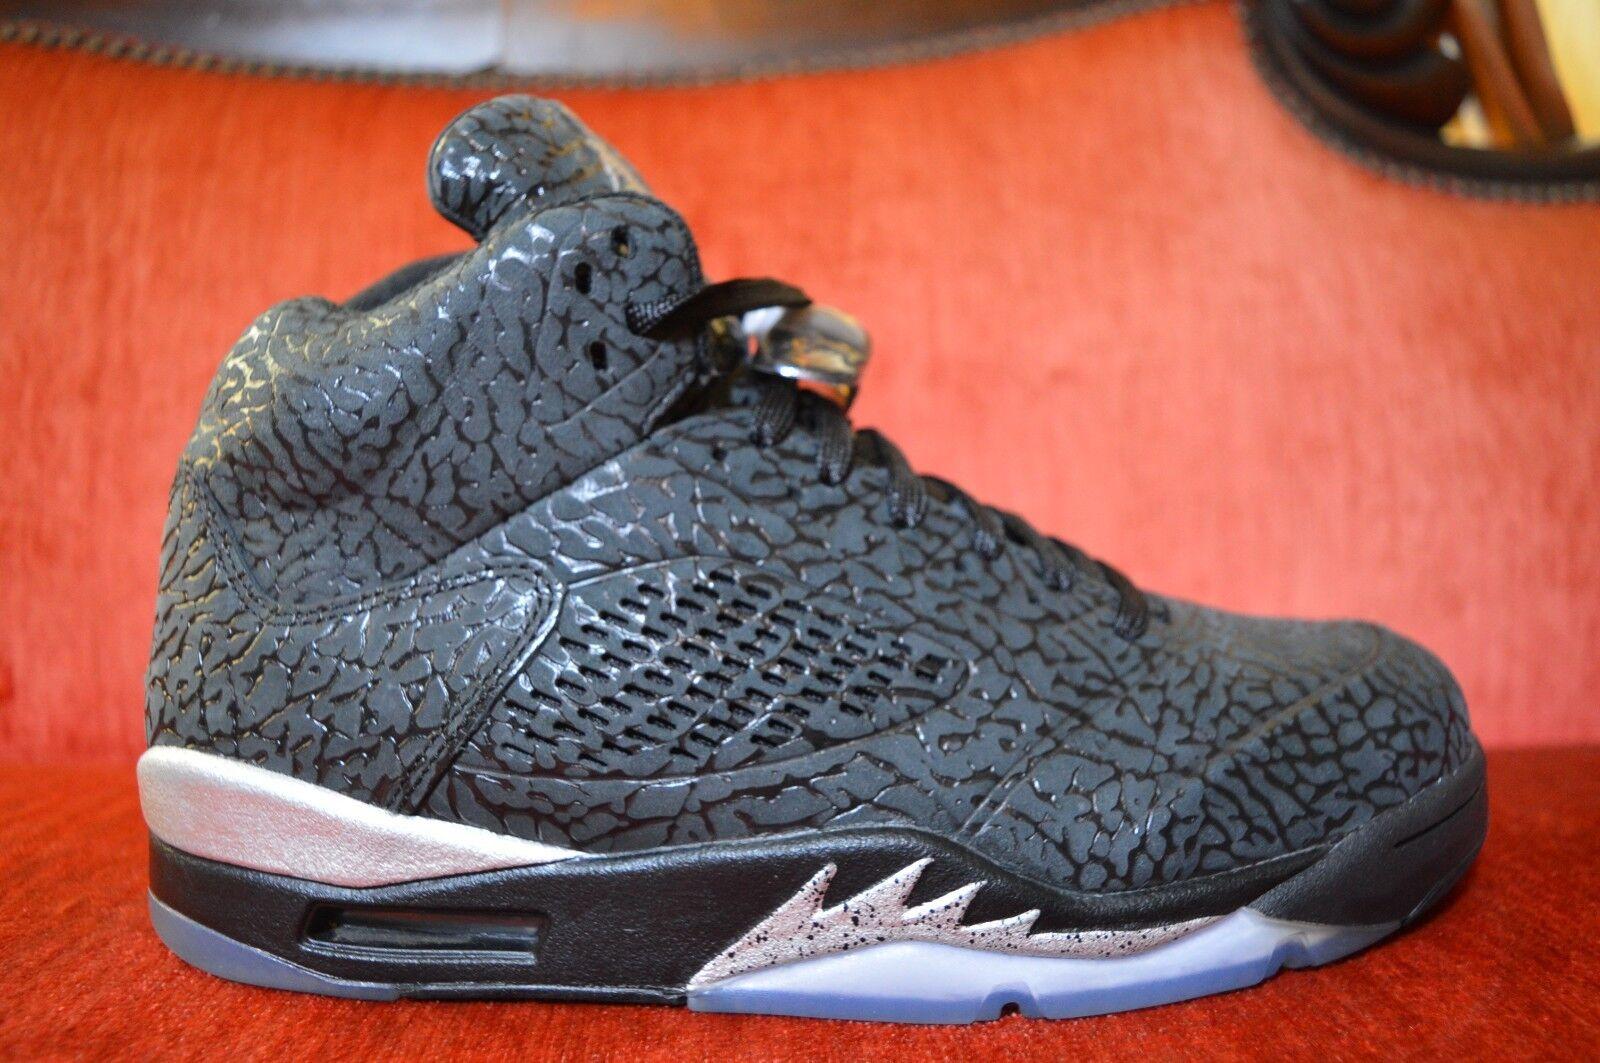 Nike Air Jordan 5 Retro 3Lab5 Black Elephant Silver V Size 9.5 2014 599581-003